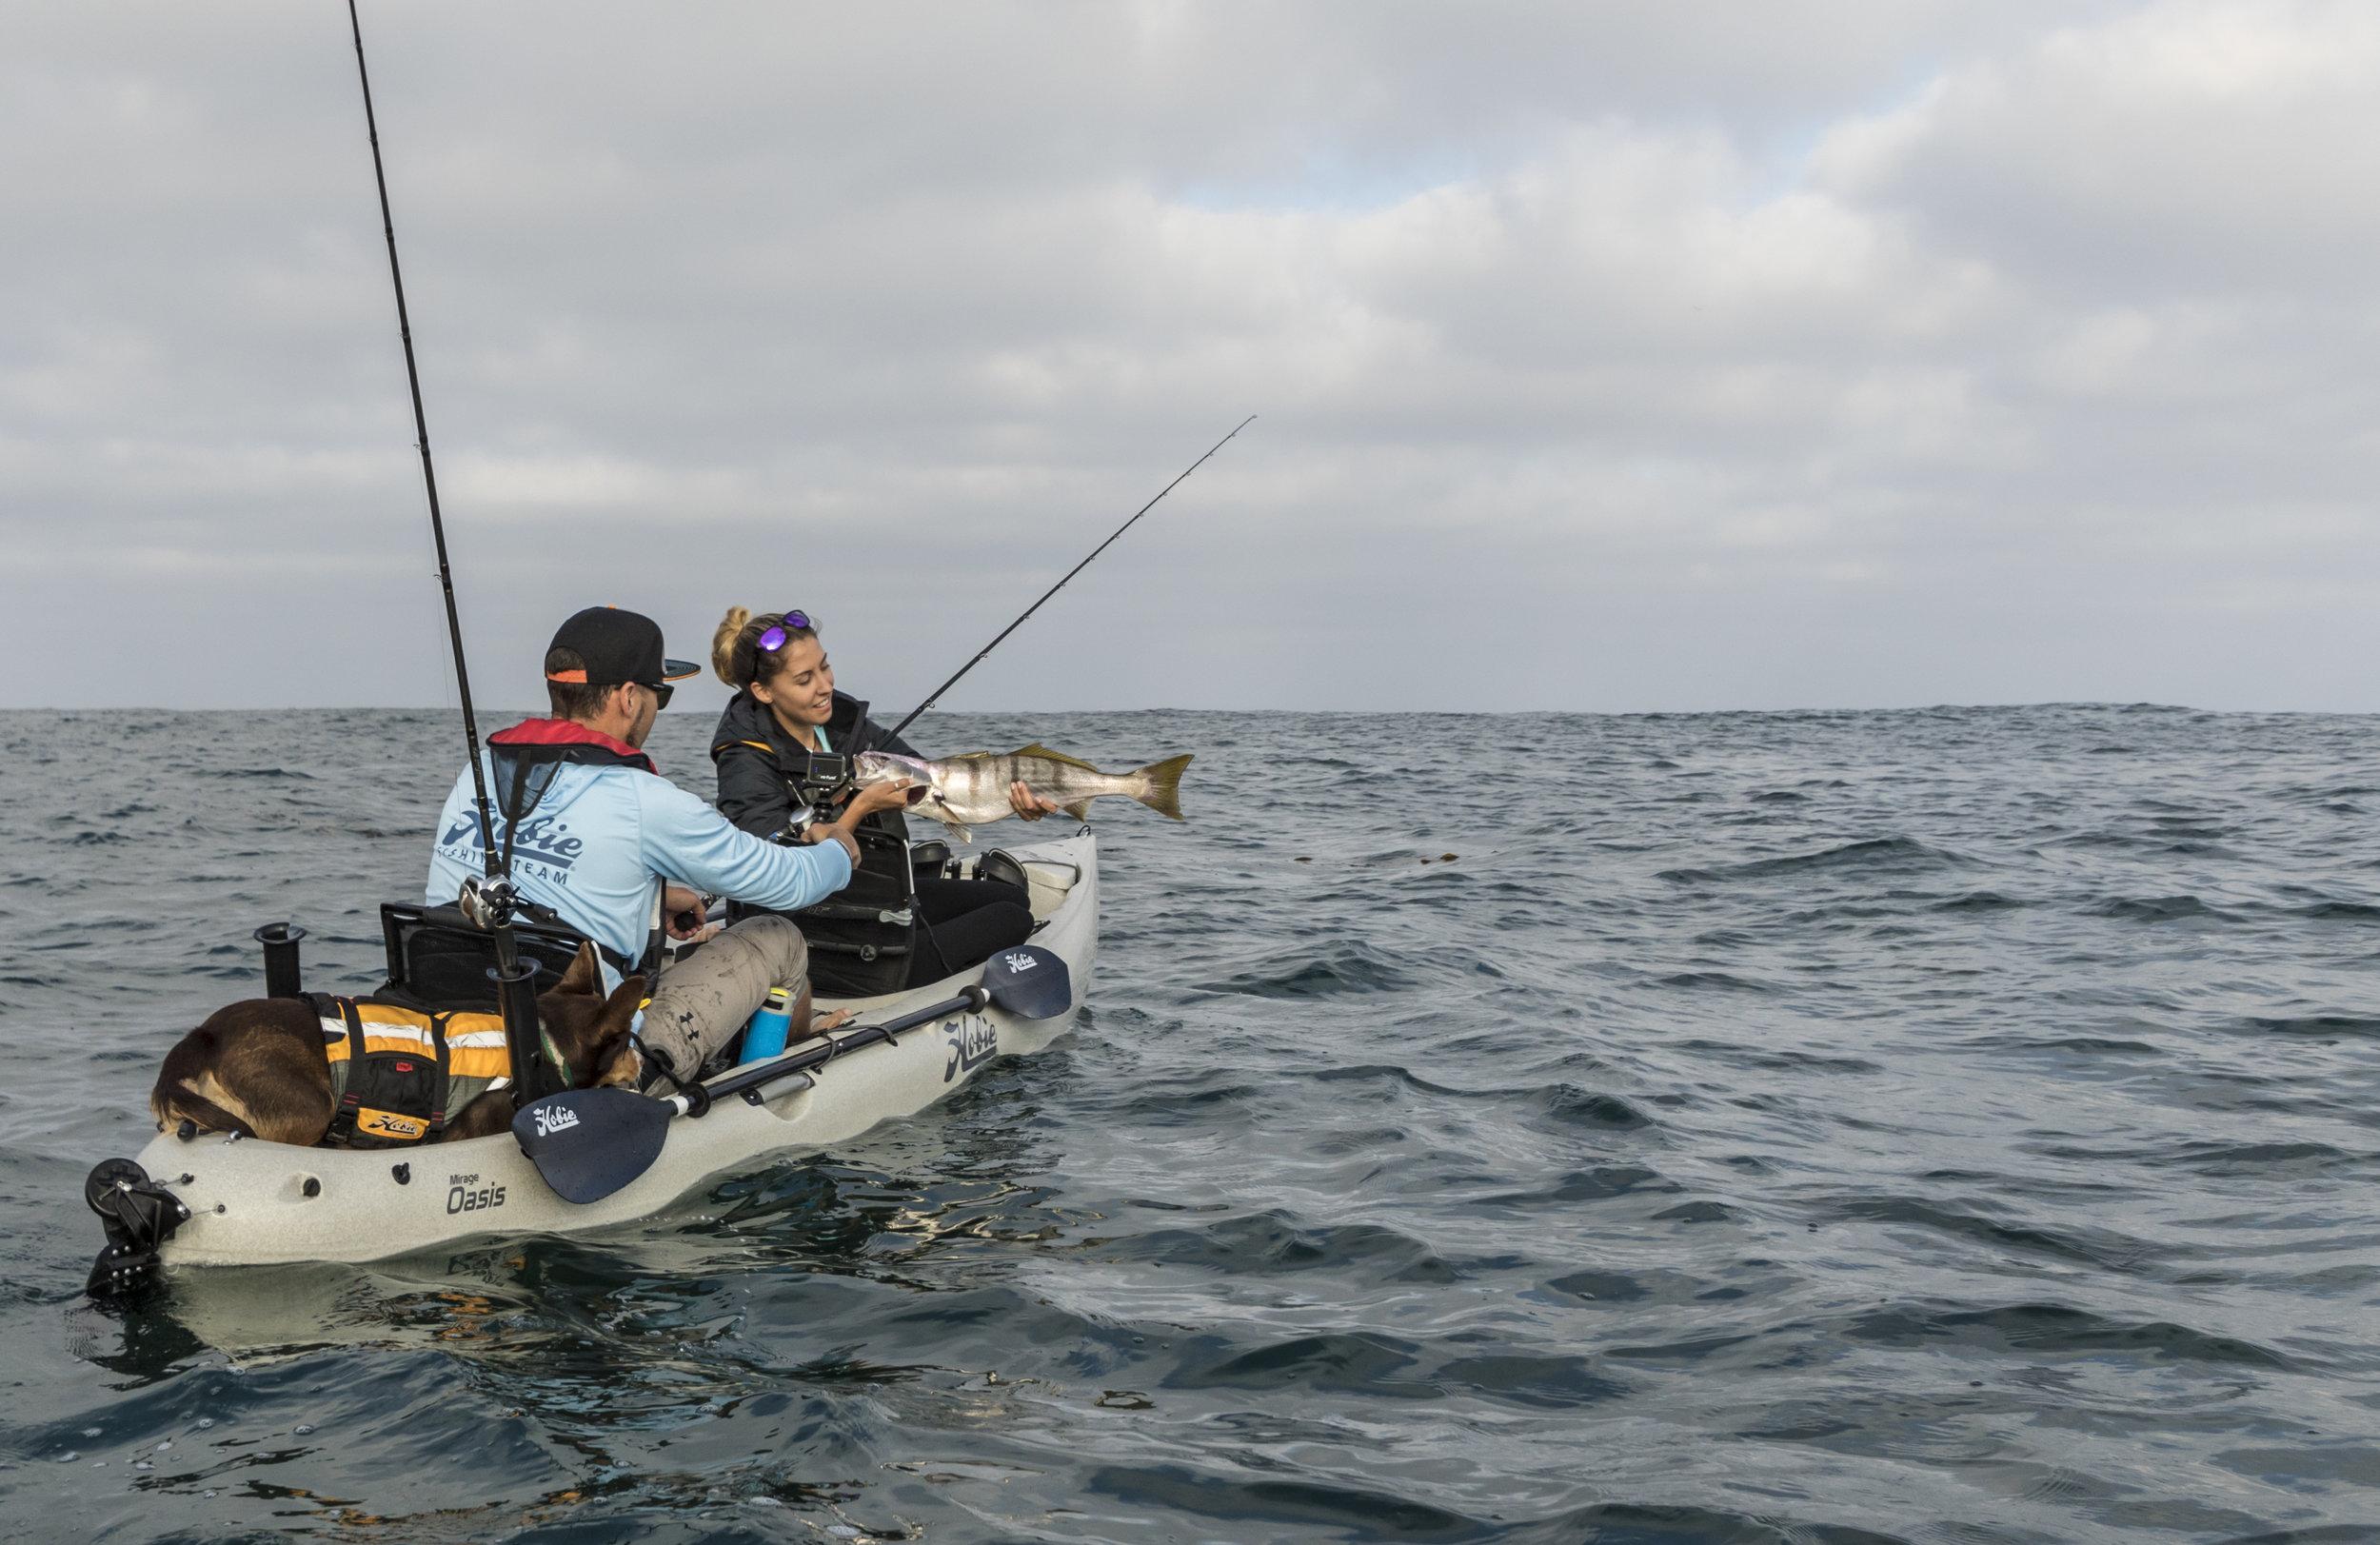 Oasis_action_fishing_dune_seabass_grip_couple_dog.jpg